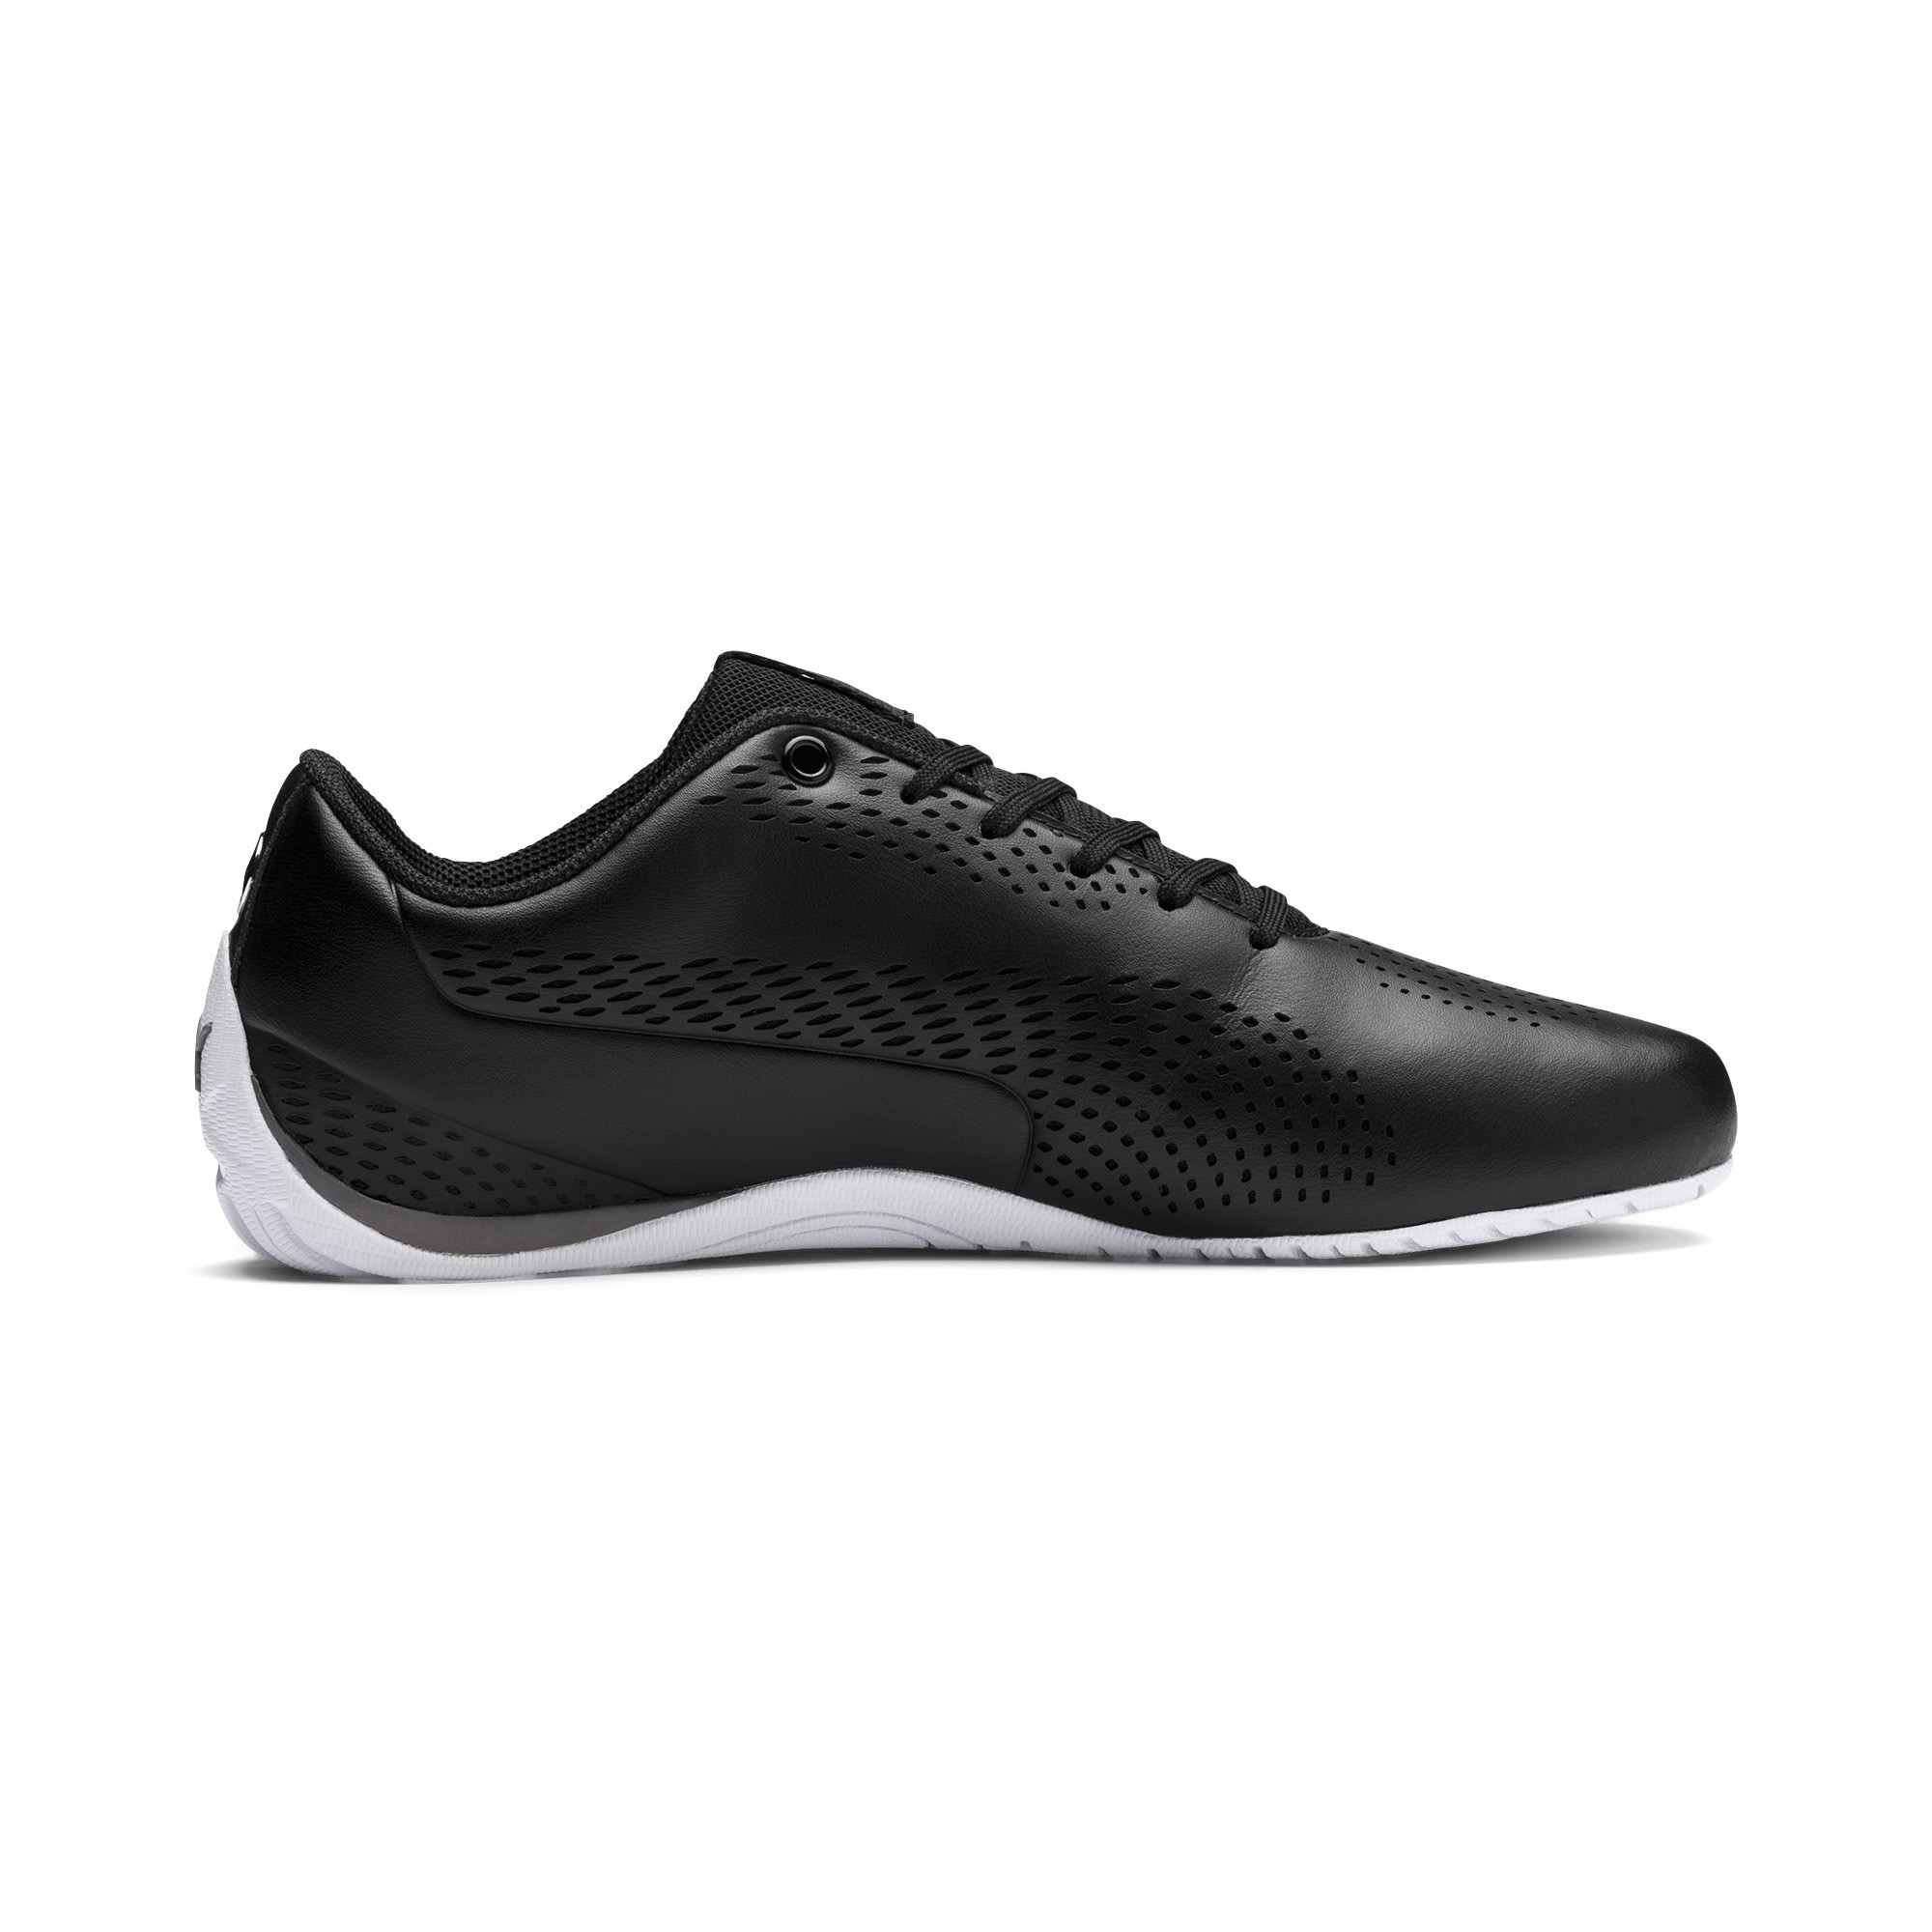 PUMA-Mercedes-AMG-Petronas-Drift-Cat-5-Ultra-II-Sneaker-Unisex-Schuhe-Neu Indexbild 11